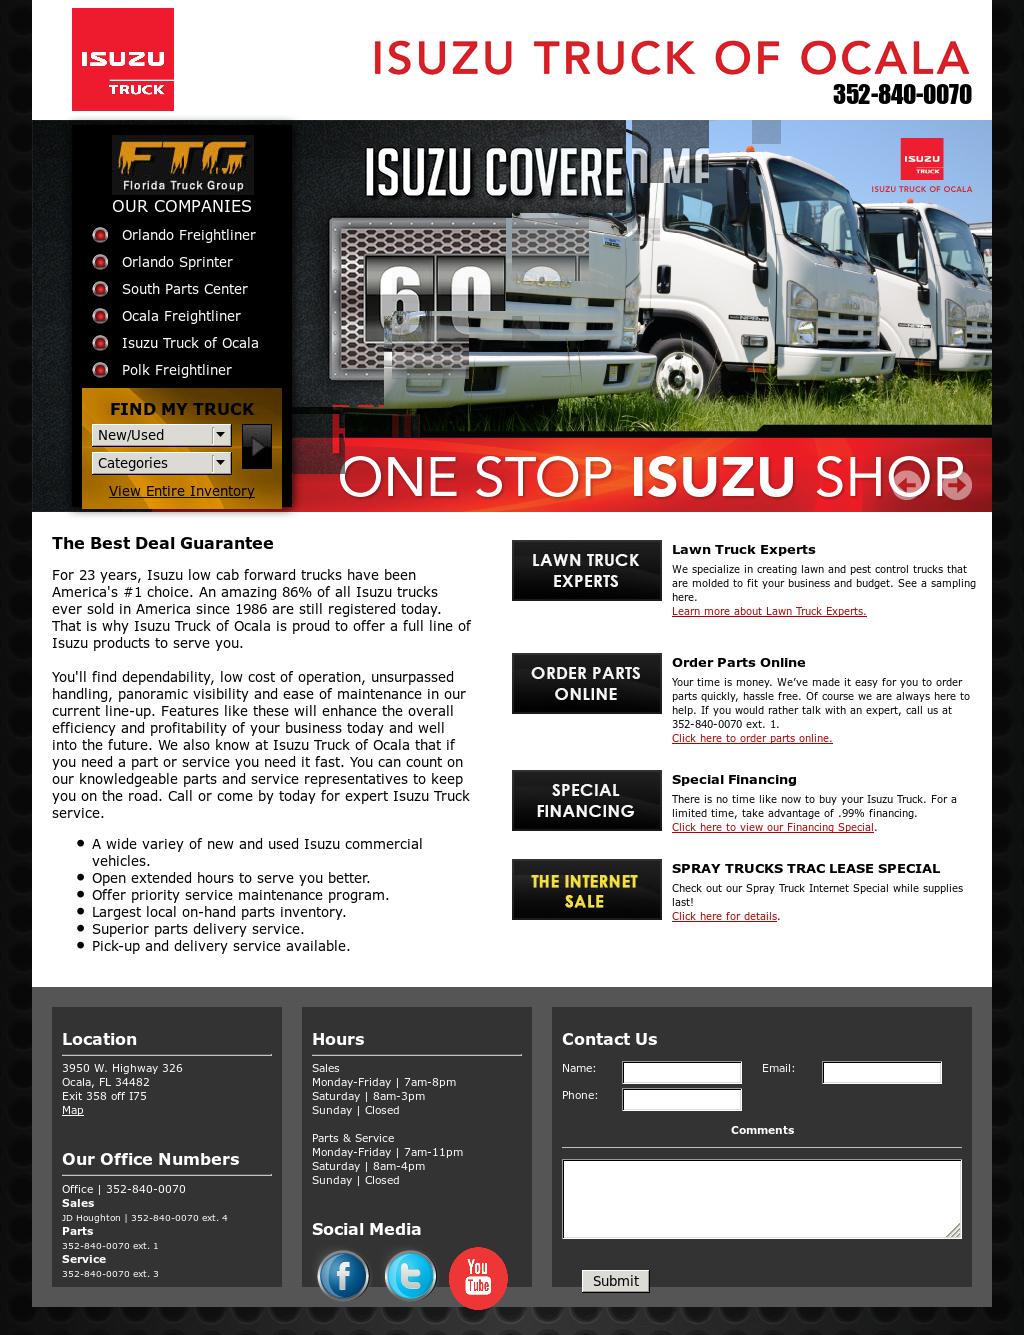 Isuzutruckofocala Competitors, Revenue and Employees - Owler